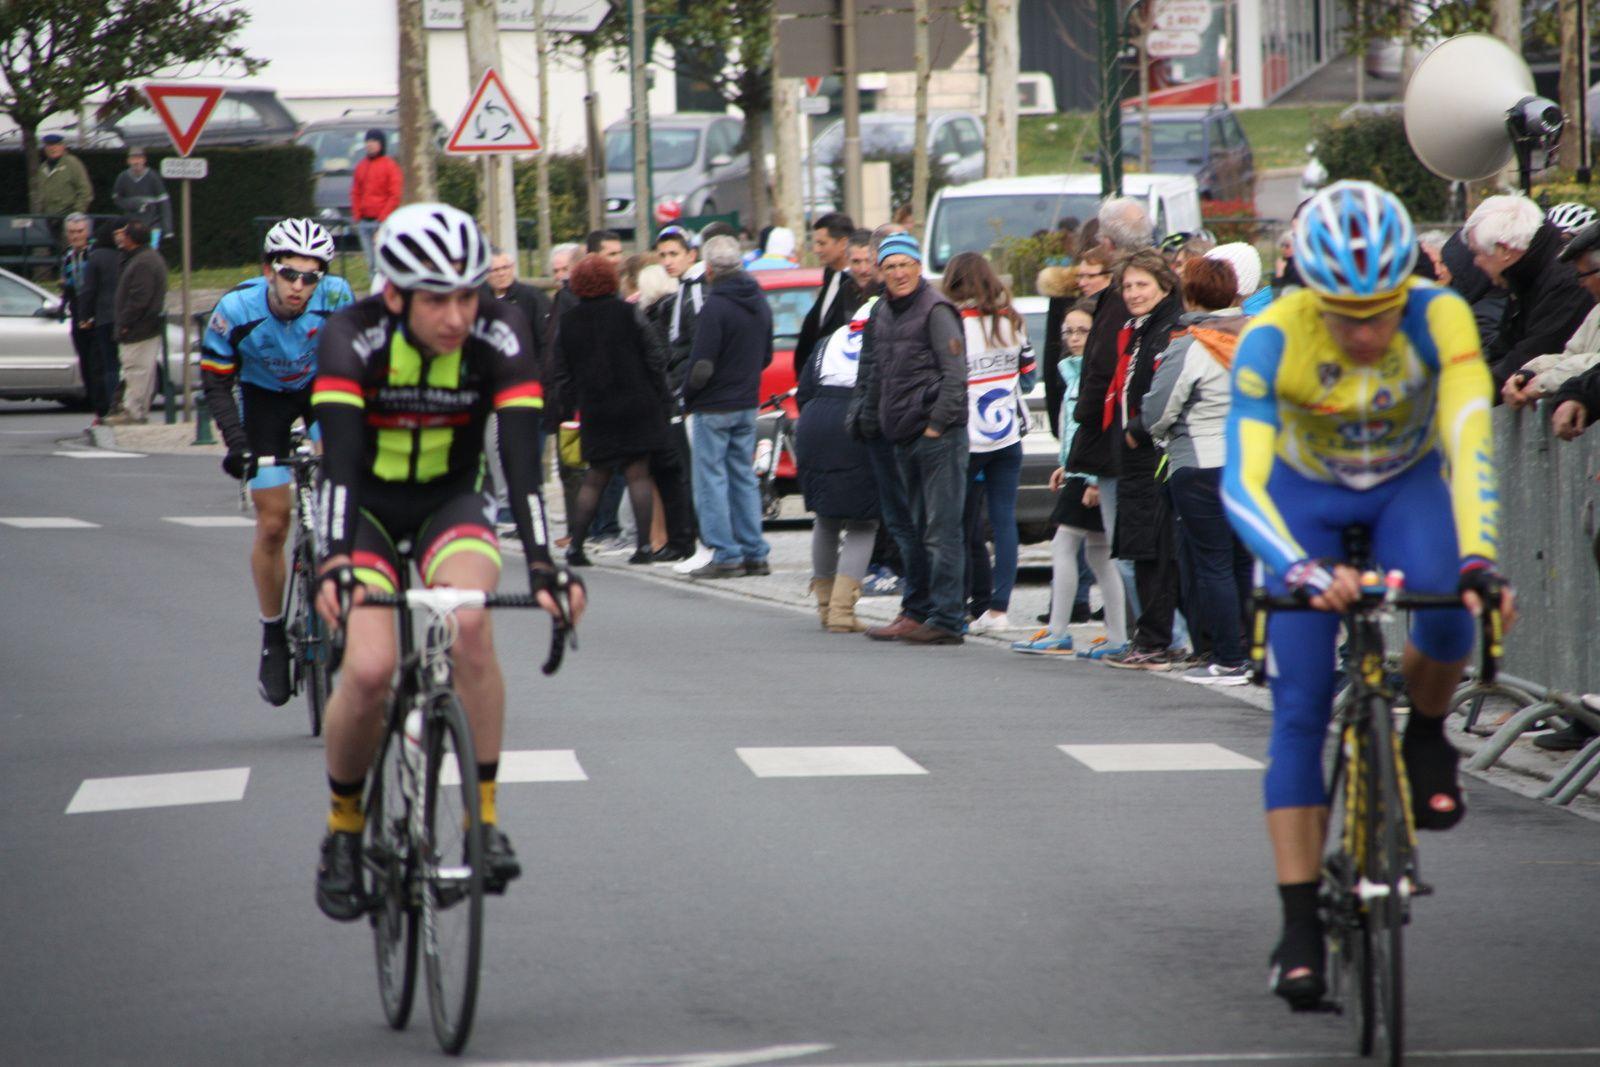 16e  Romain  LEFRANCOIS(UV  Limousine), 17e  Florian  LOUE(AL  Gond-Pontouvre)